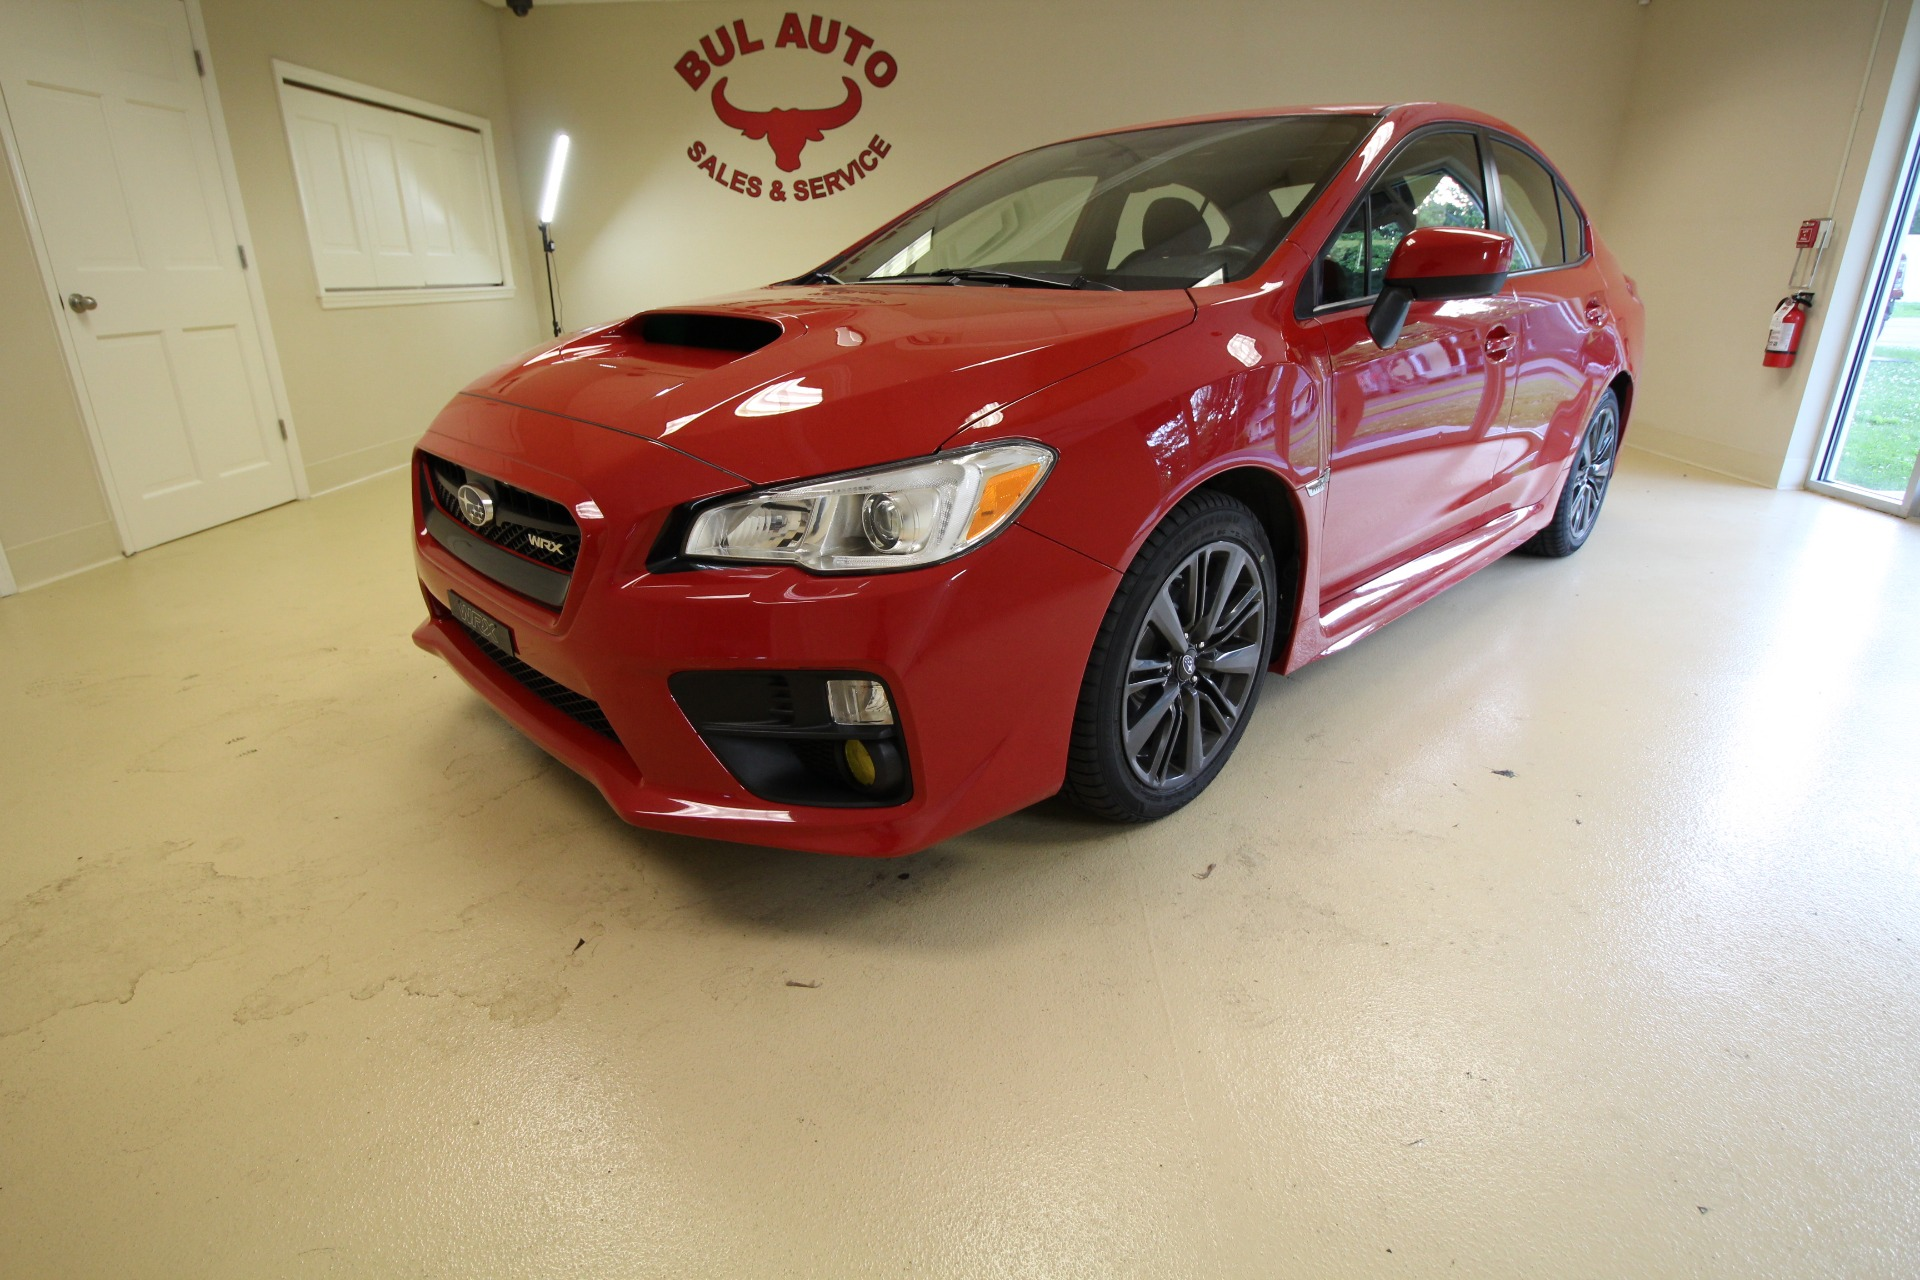 2015 Subaru Wrx Premium 4 Door Stock 18118 For Sale Near Albany